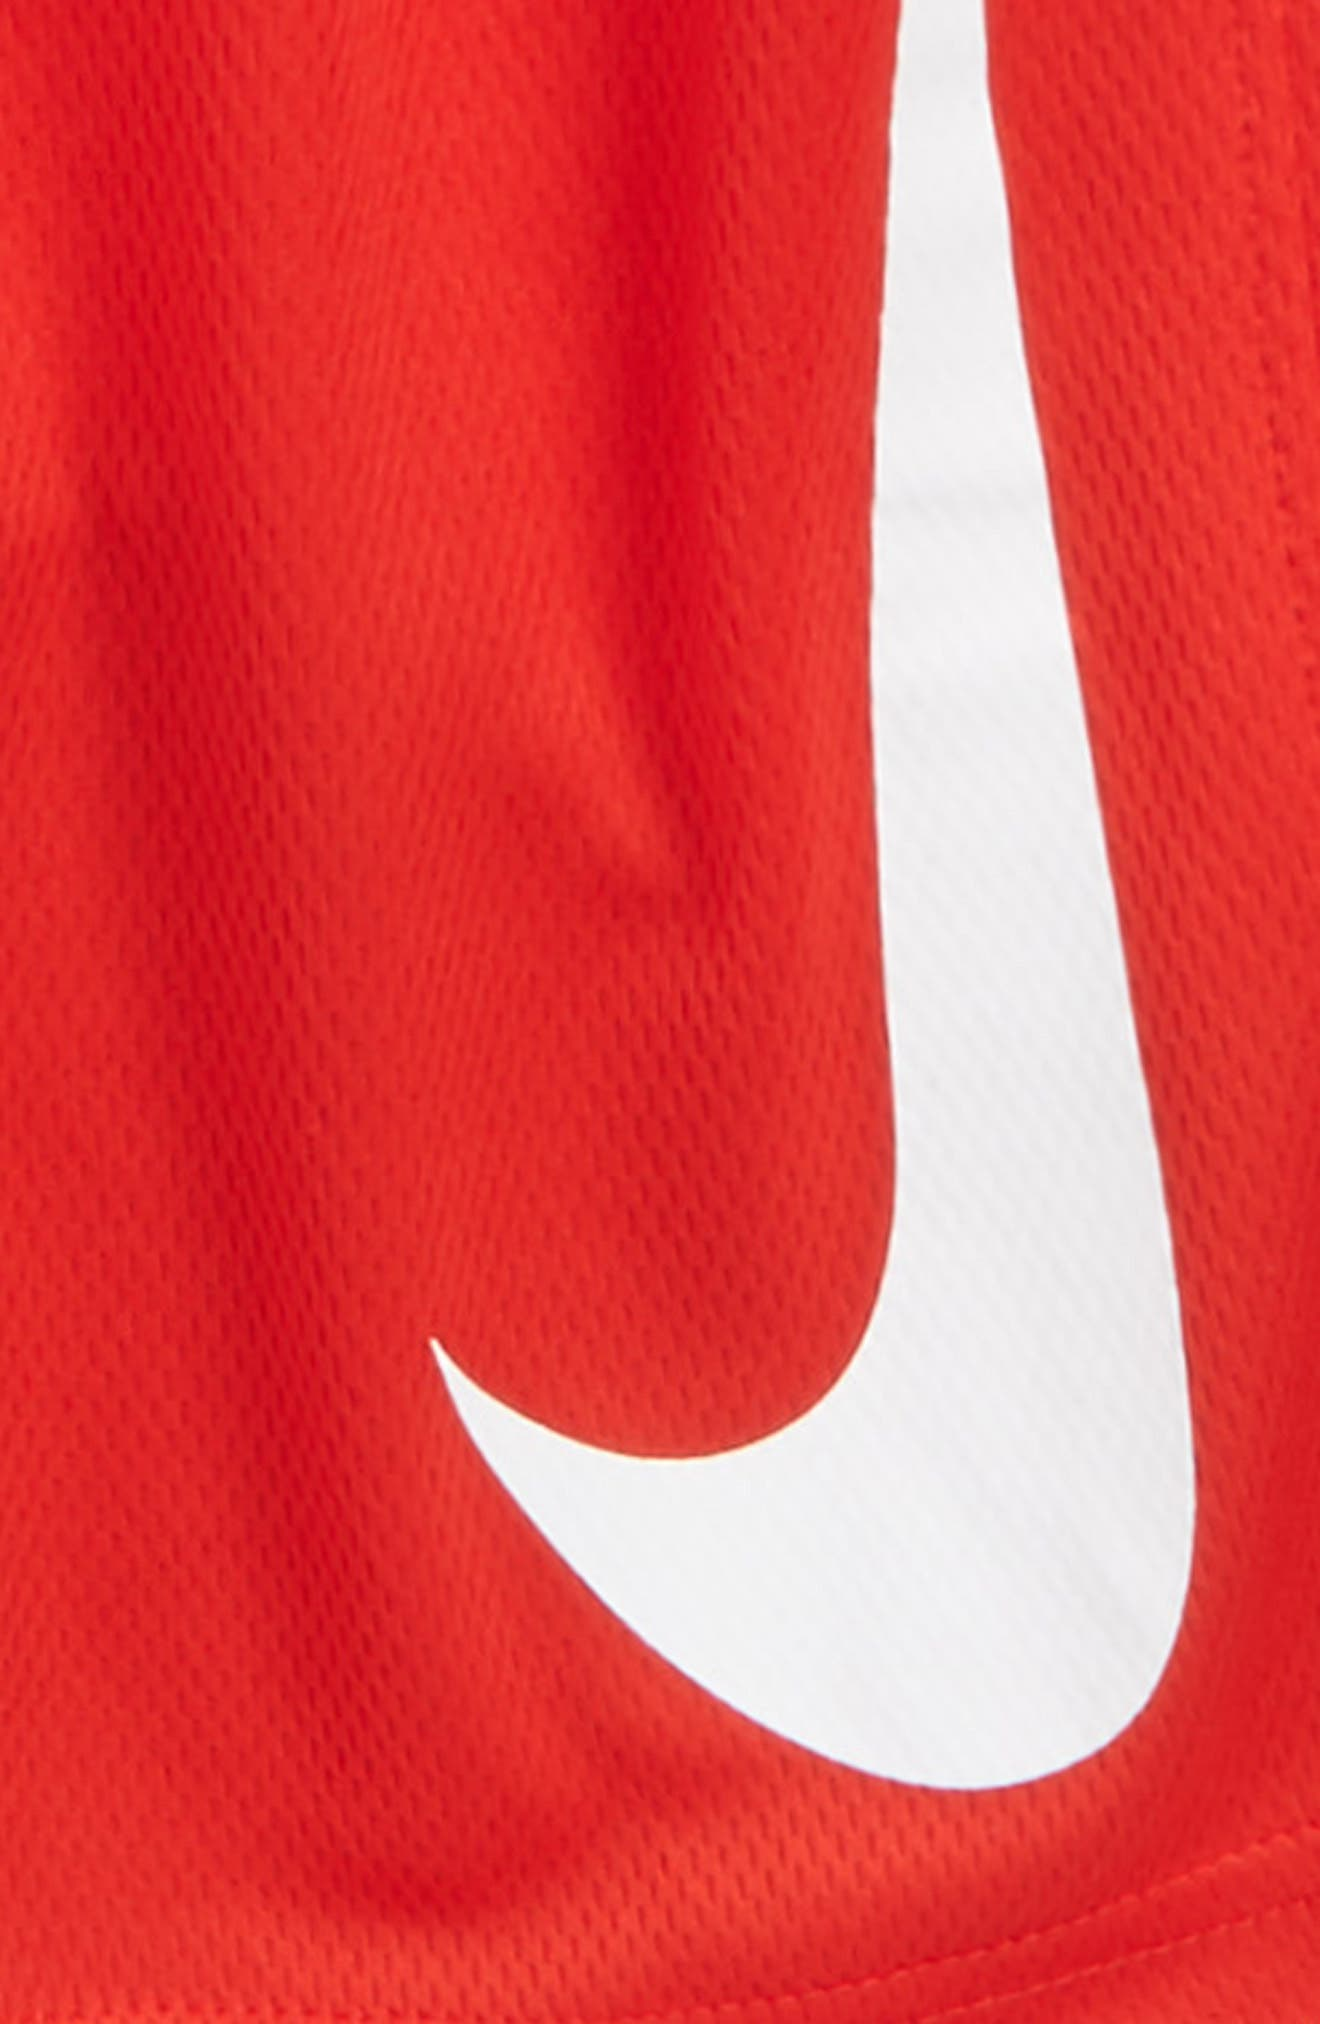 Dry Shorts,                             Alternate thumbnail 2, color,                             University Red/ Black